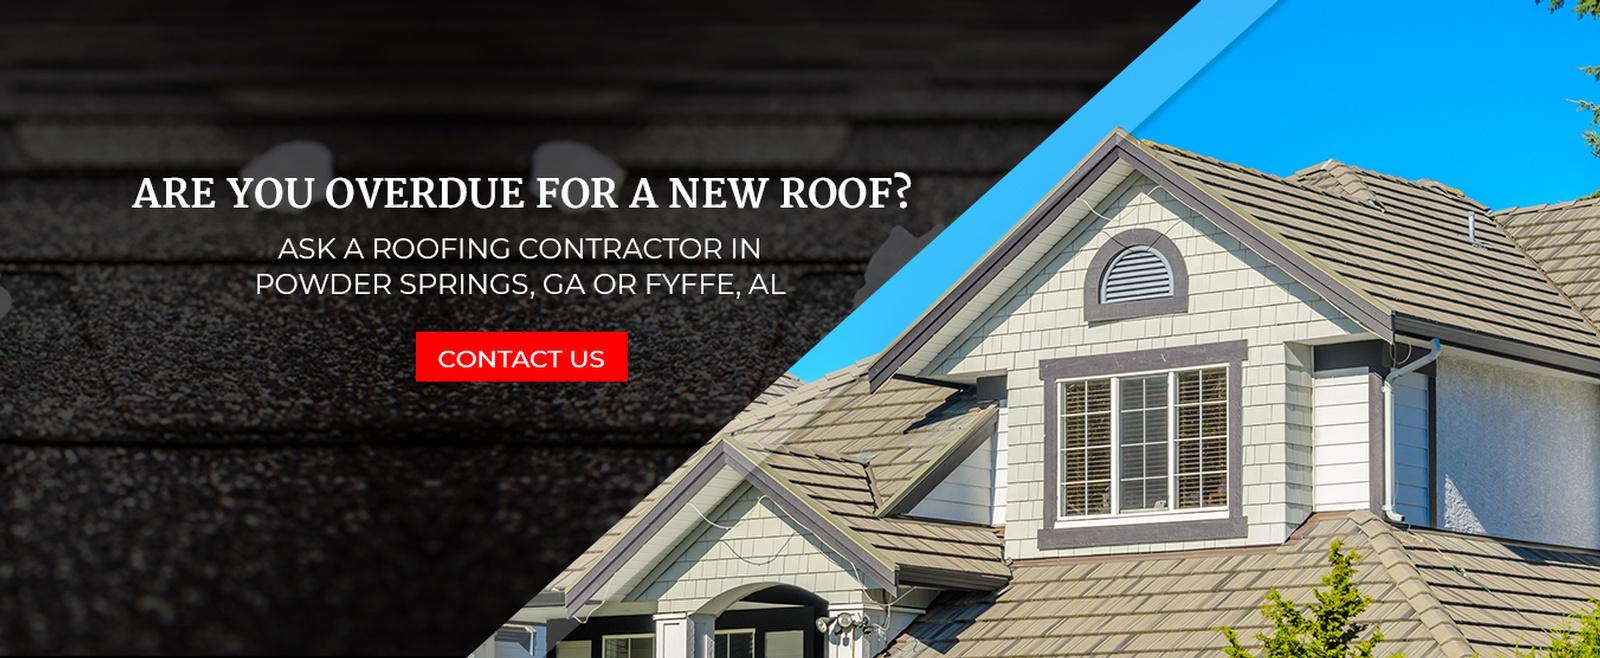 K S Contractors Inc Owens Corning Roofing Preferred Contractors